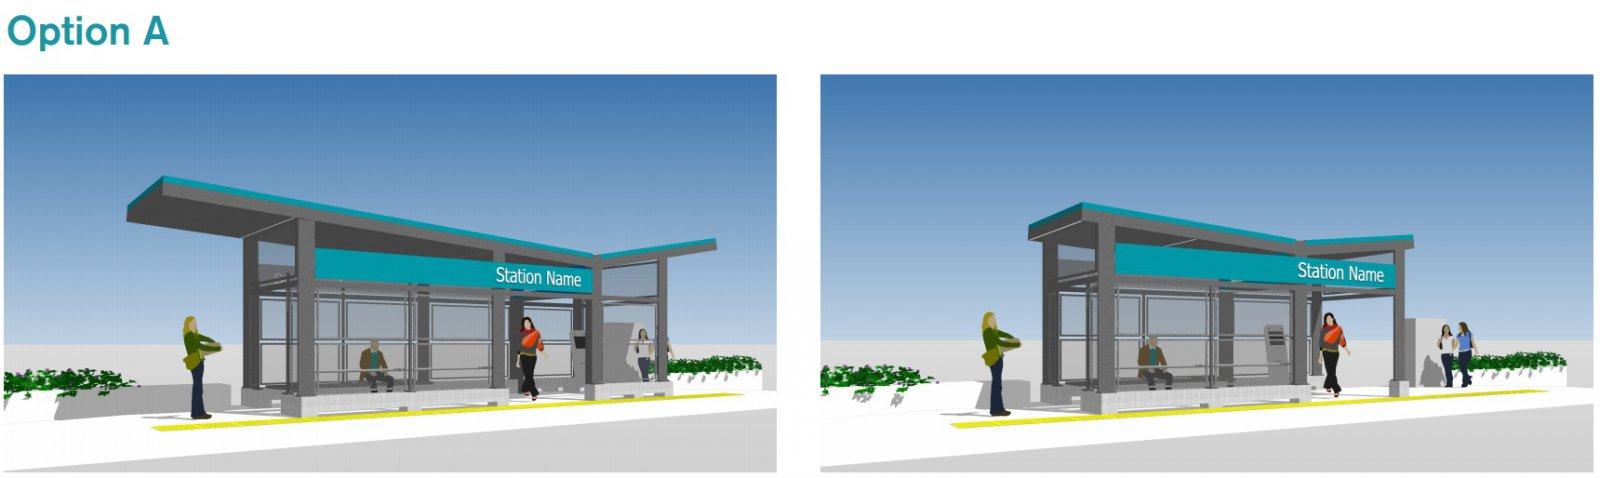 BRT Station Option A